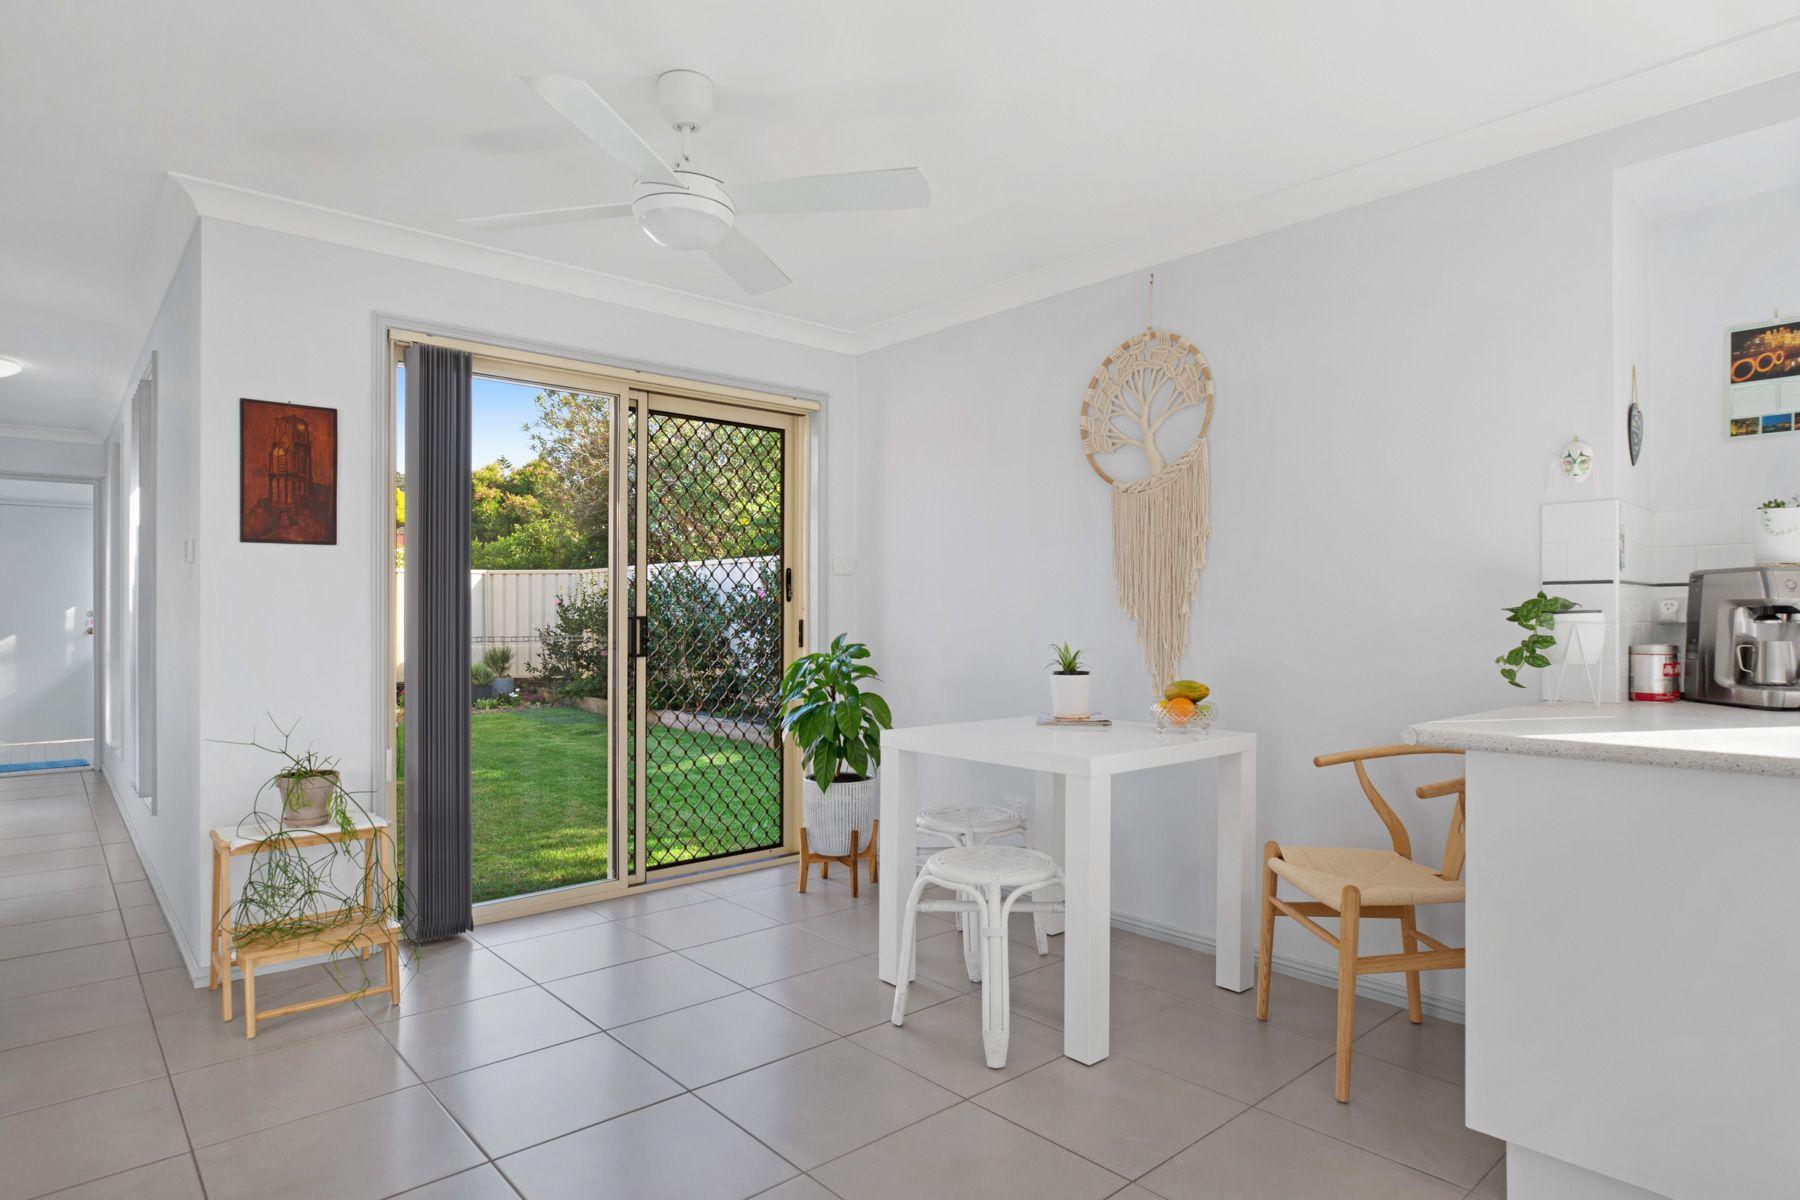 63 Medcalf Street, Warners Bay, NSW 2282